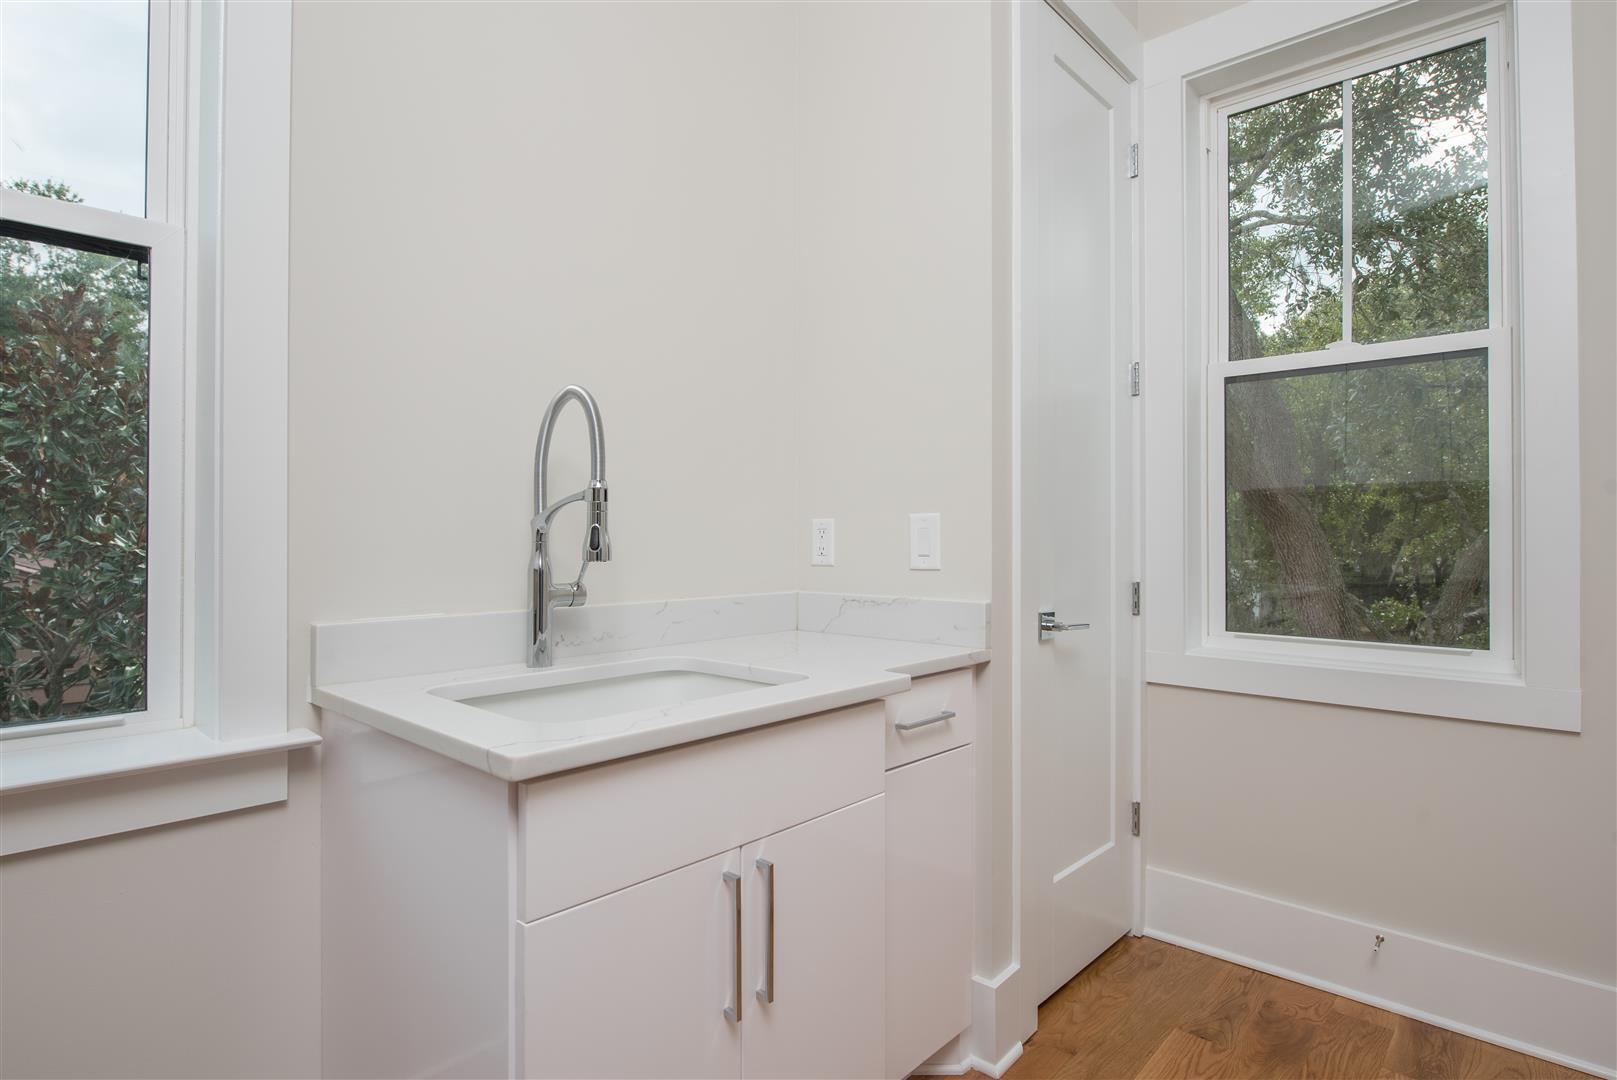 Scanlonville Homes For Sale - 160 5th, Mount Pleasant, SC - 0